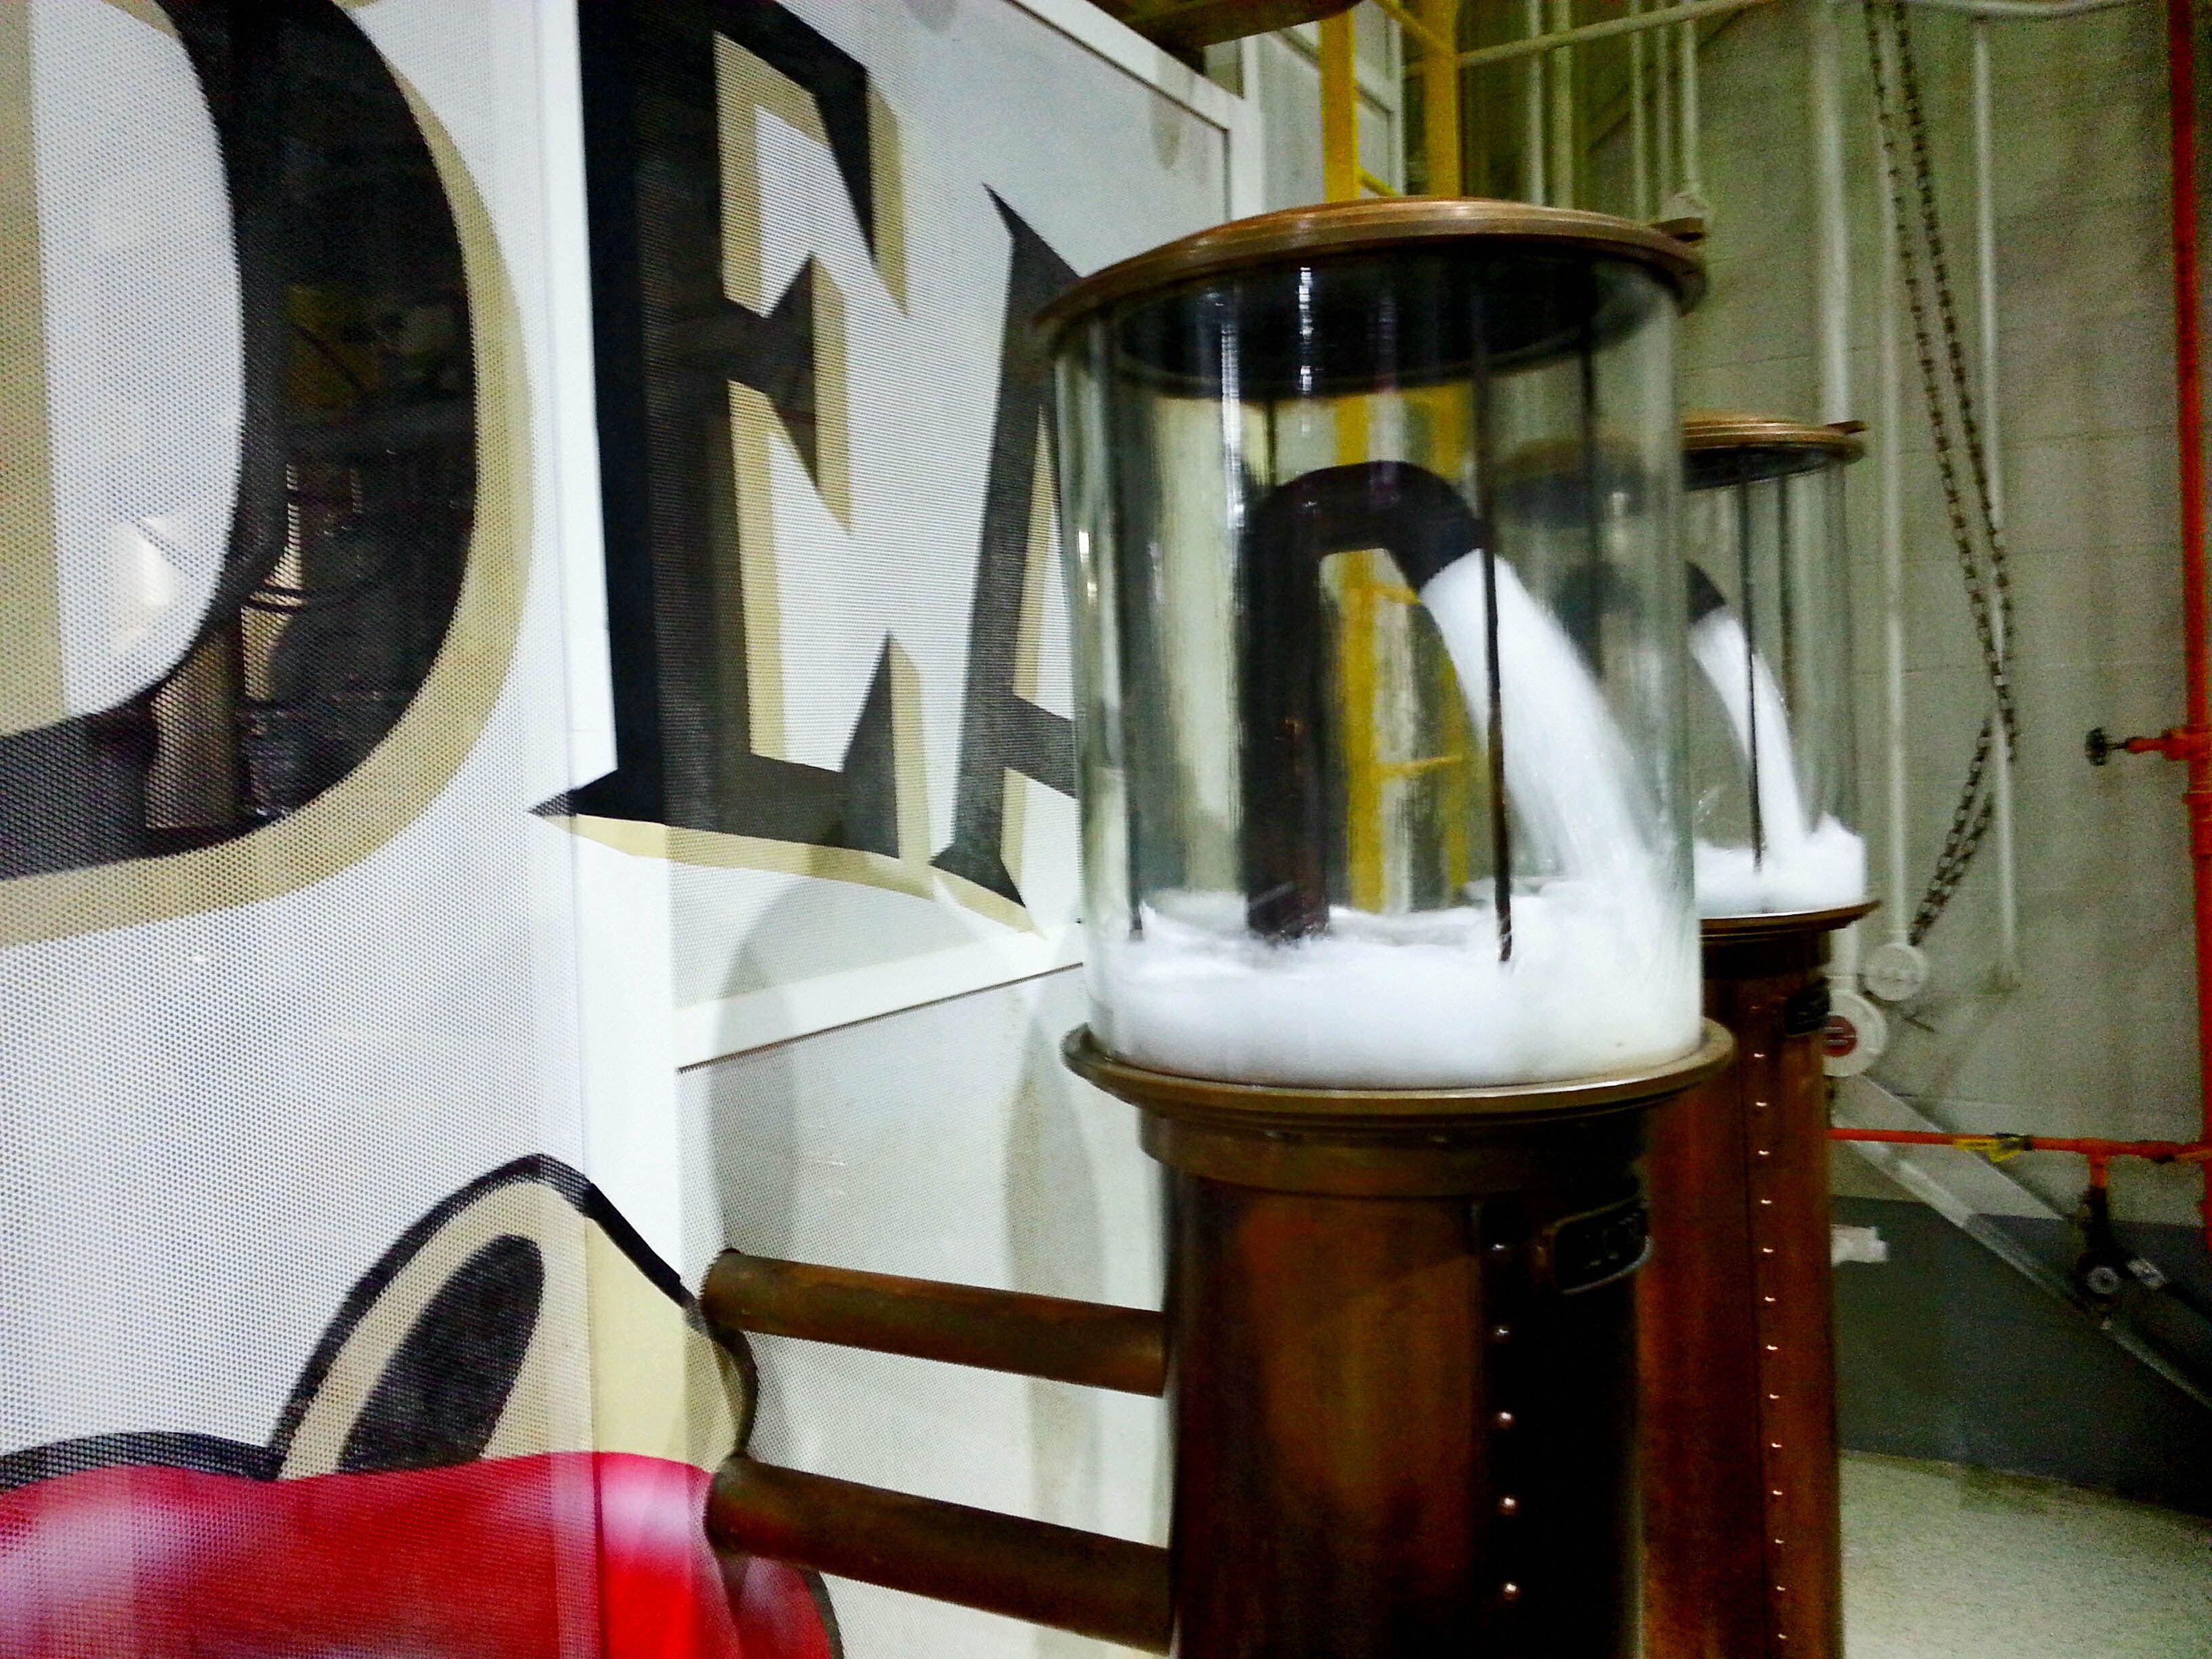 Collumn still at the Jim Beam American Stillhouse, photo by Keith Allison